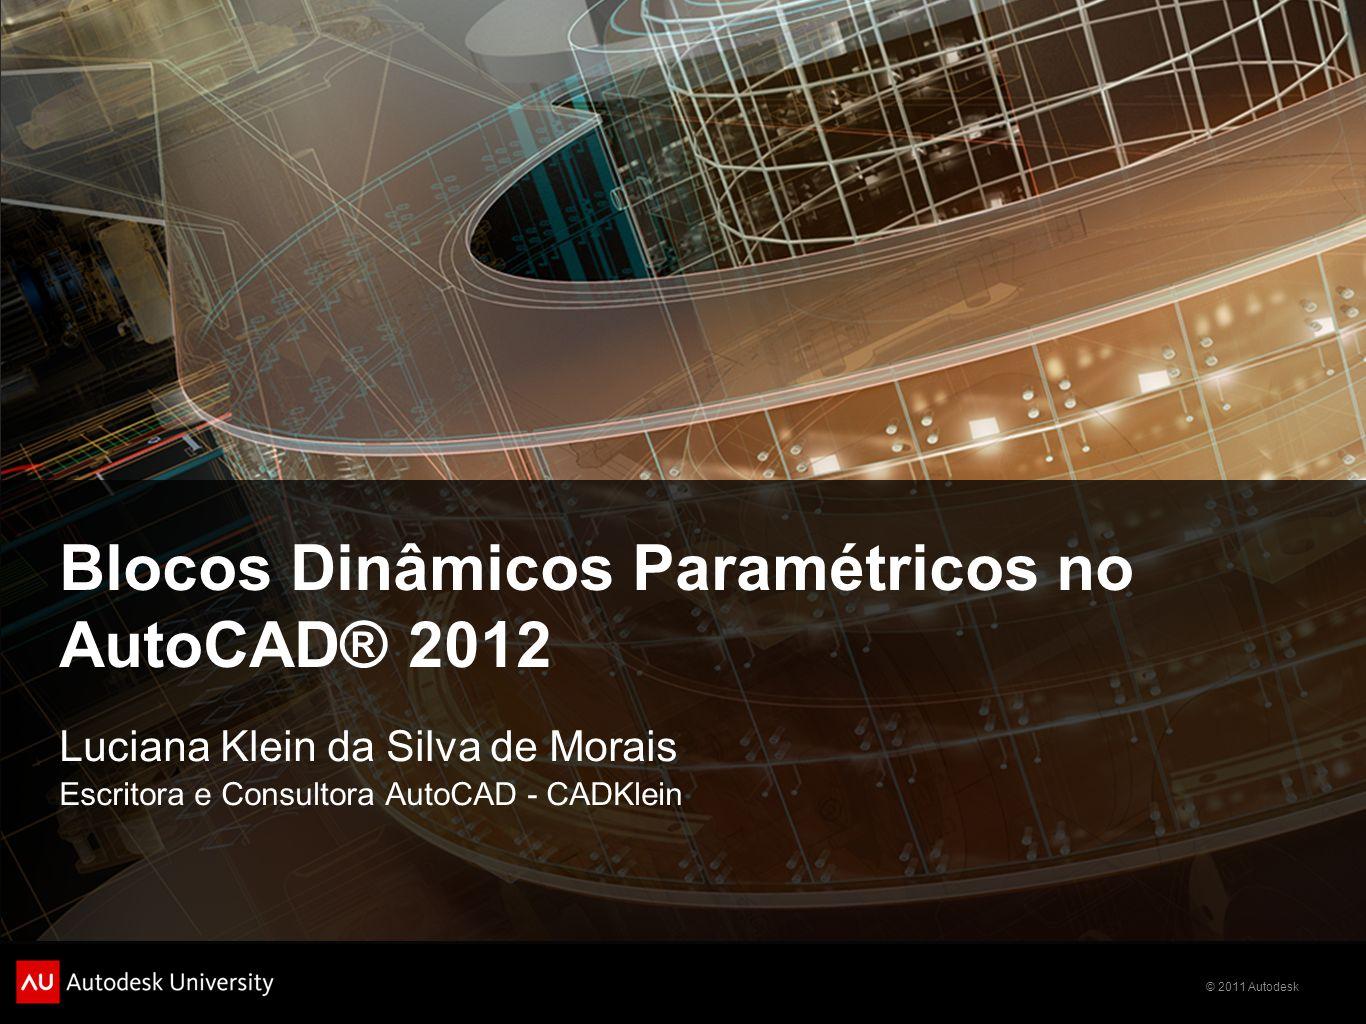 Blocos Dinâmicos Paramétricos no AutoCAD® 2012